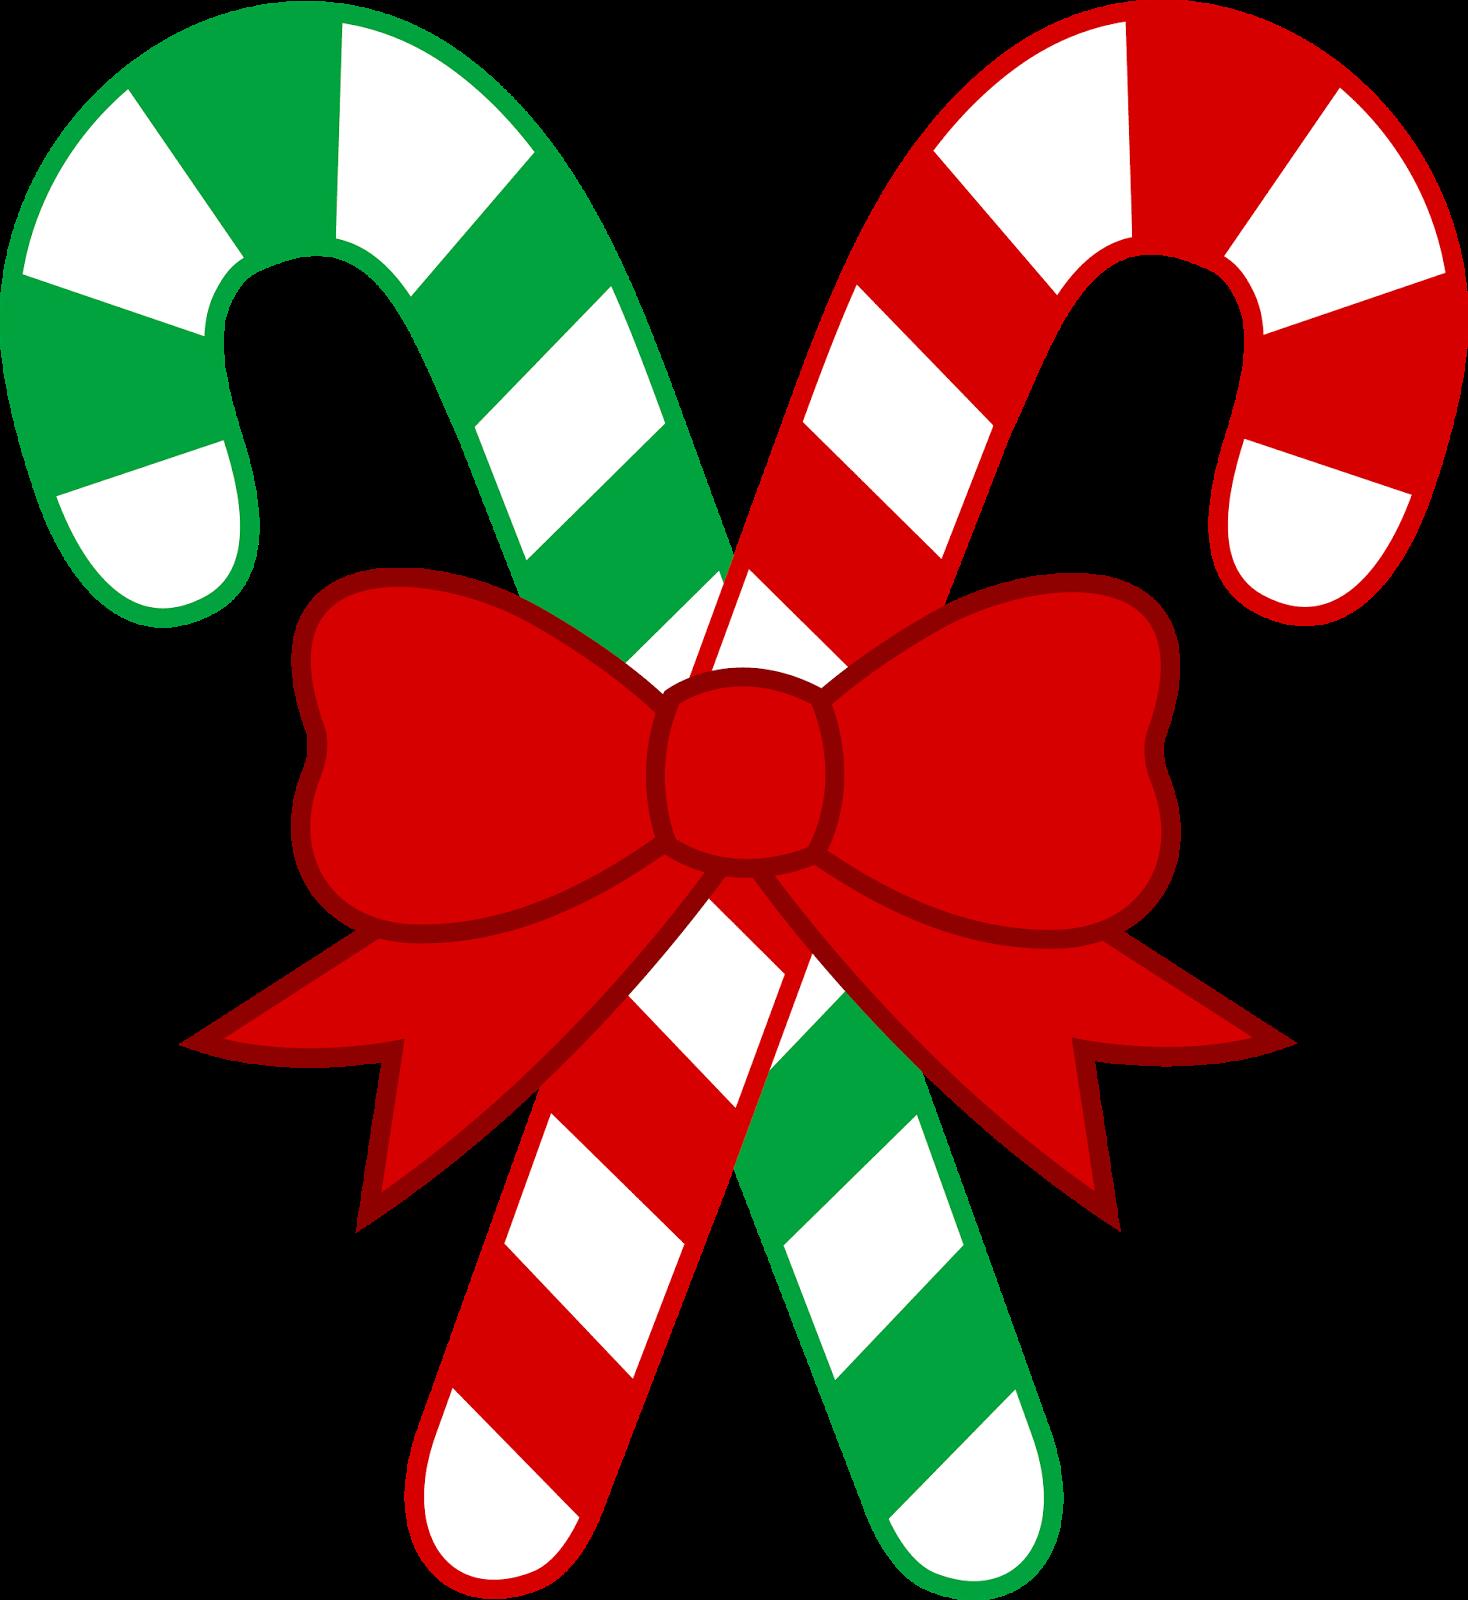 svg stock Good health clipart. Christmas holiday at getdrawings